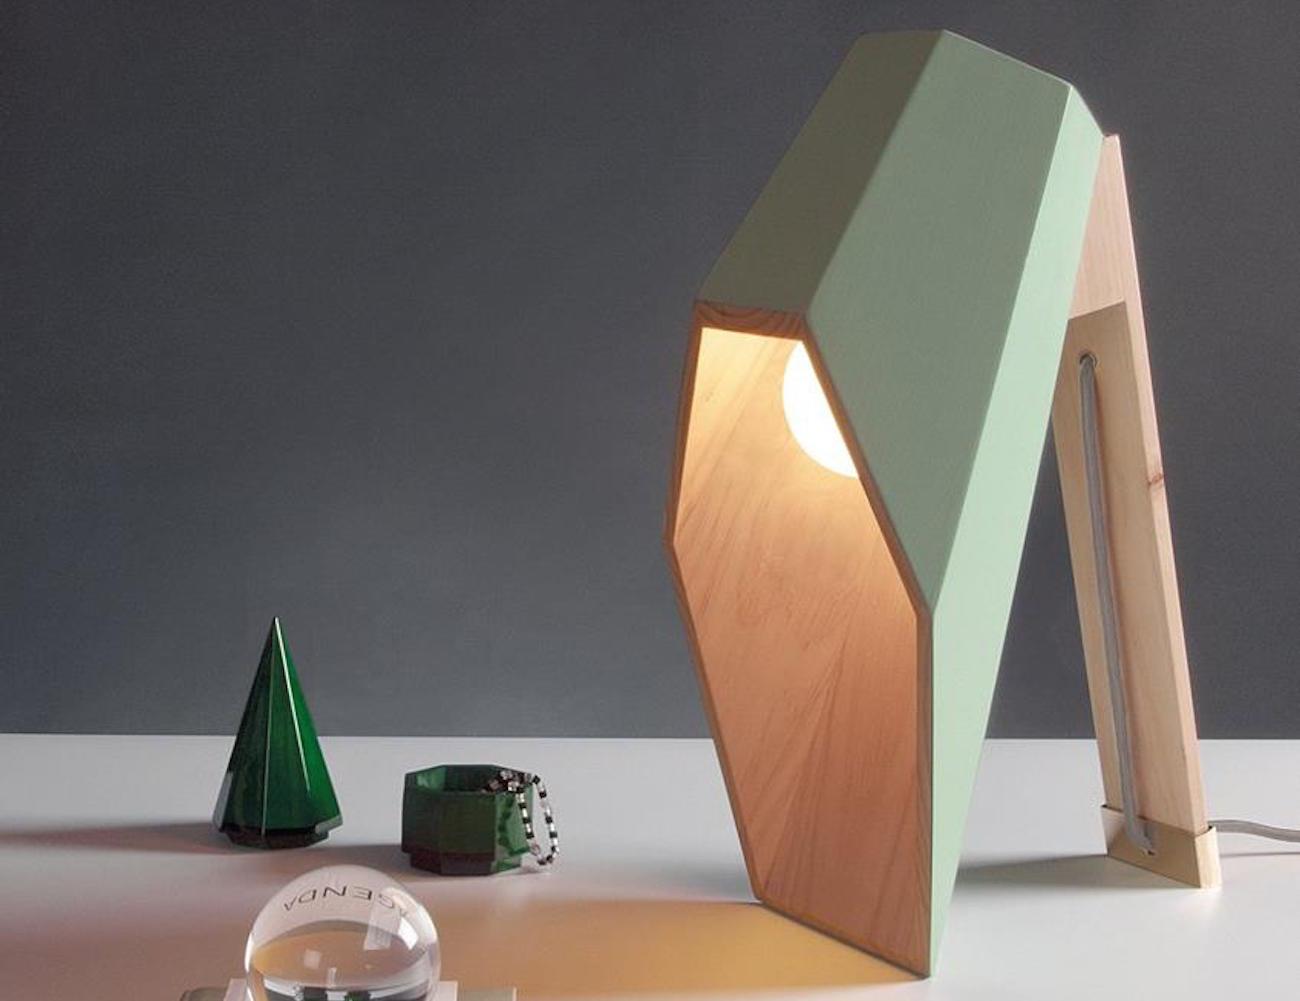 Woodspot+Table+Lamp+By+Seletti